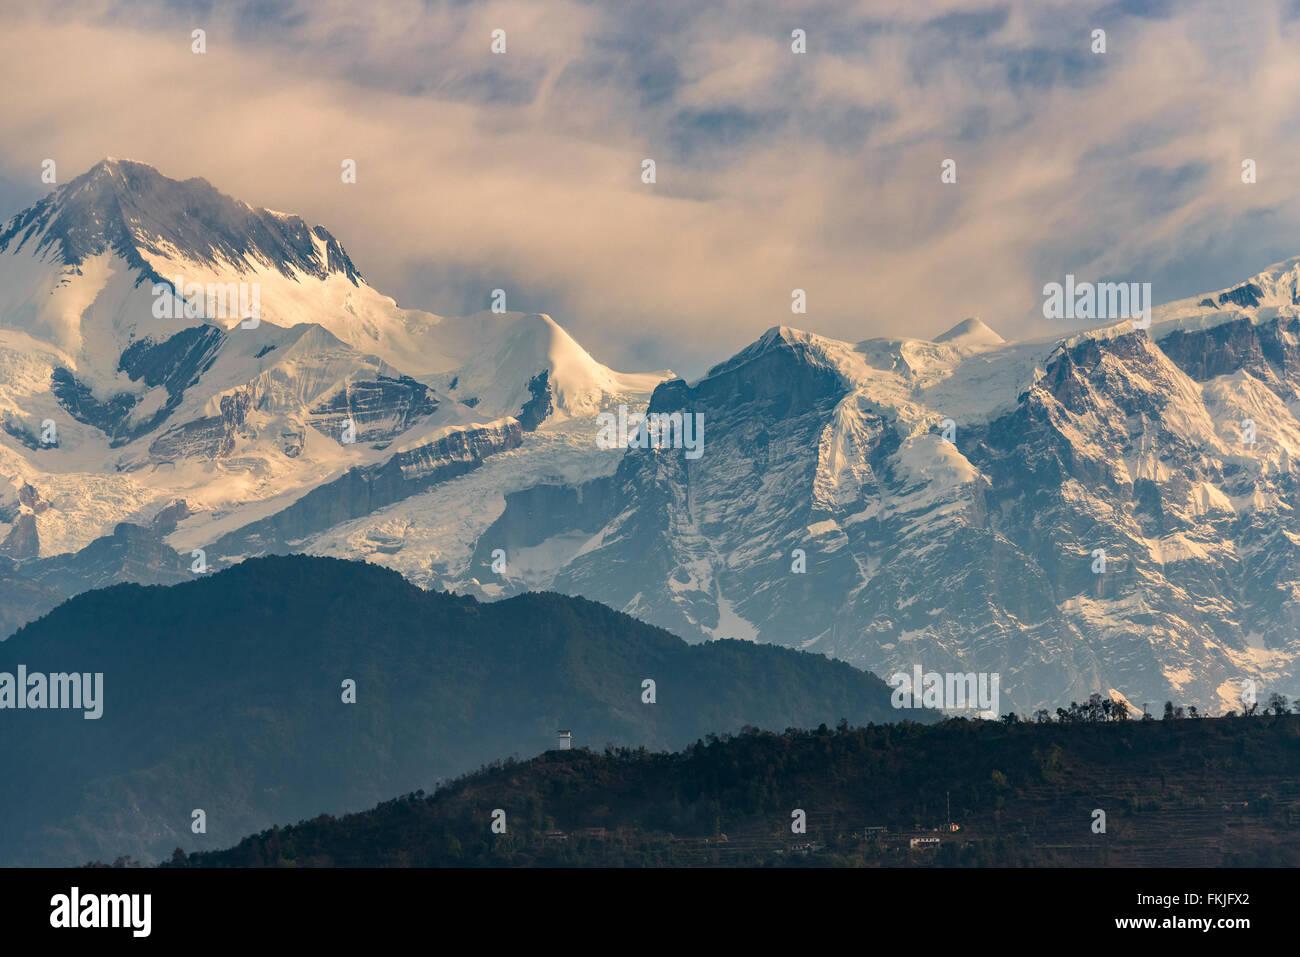 Part of the Annapurna range at sunrise - Stock Image